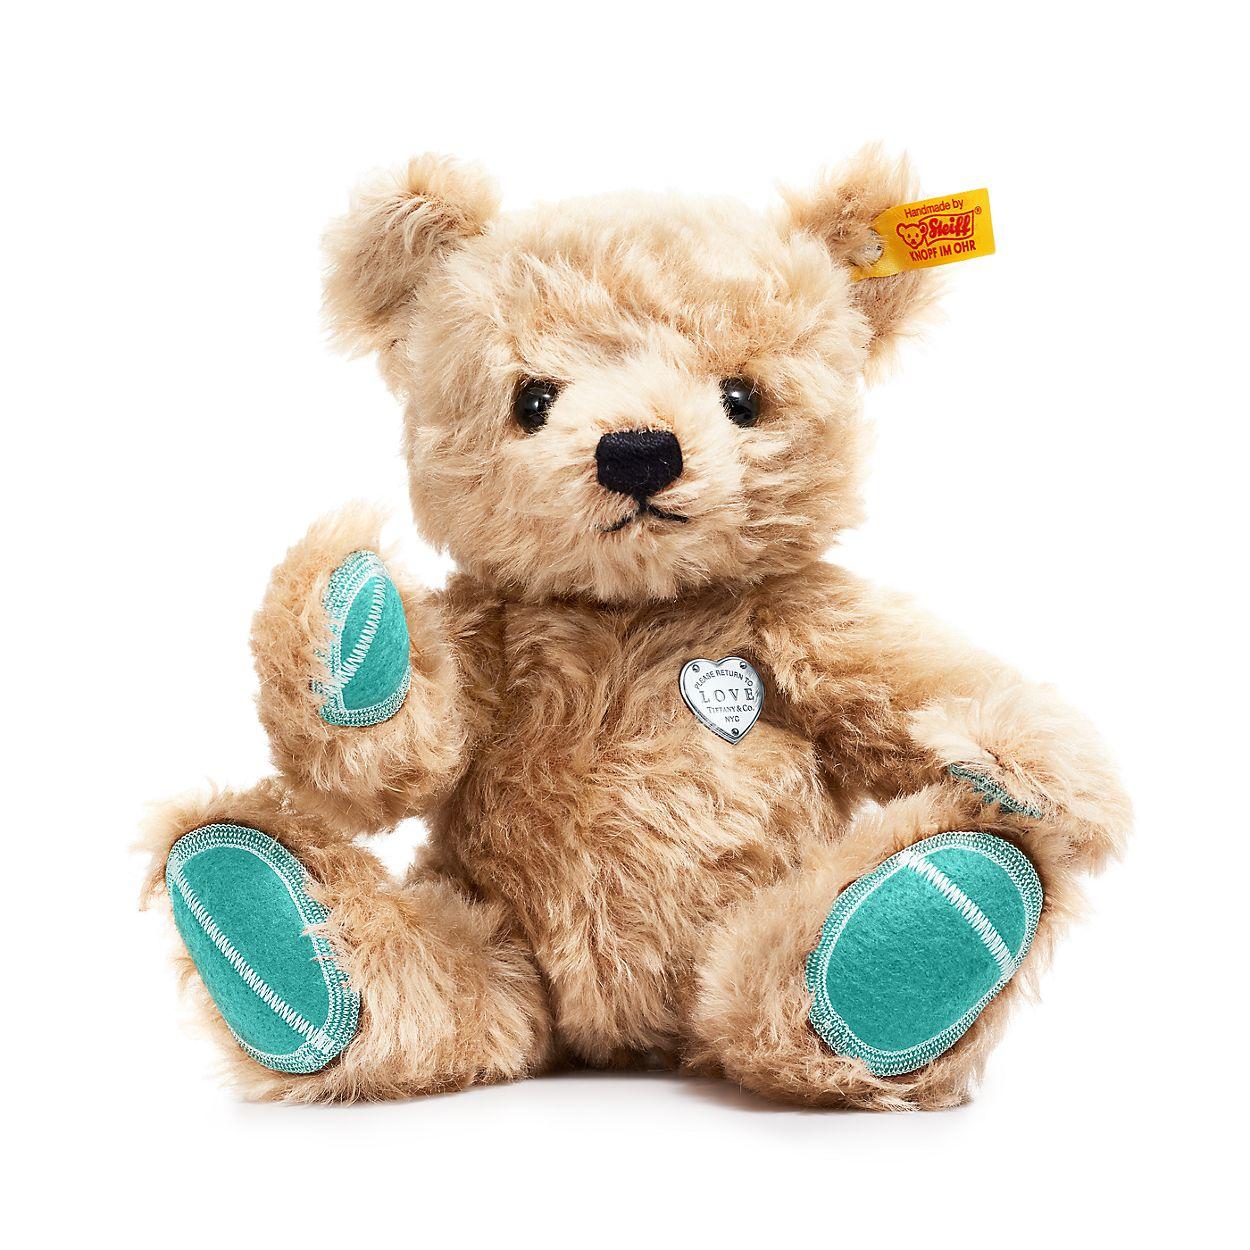 Tiffany x steiff return to tiffany love teddy bear in mohair tiffany x steiffreturn to tiffany lovebrteddy bear altavistaventures Images